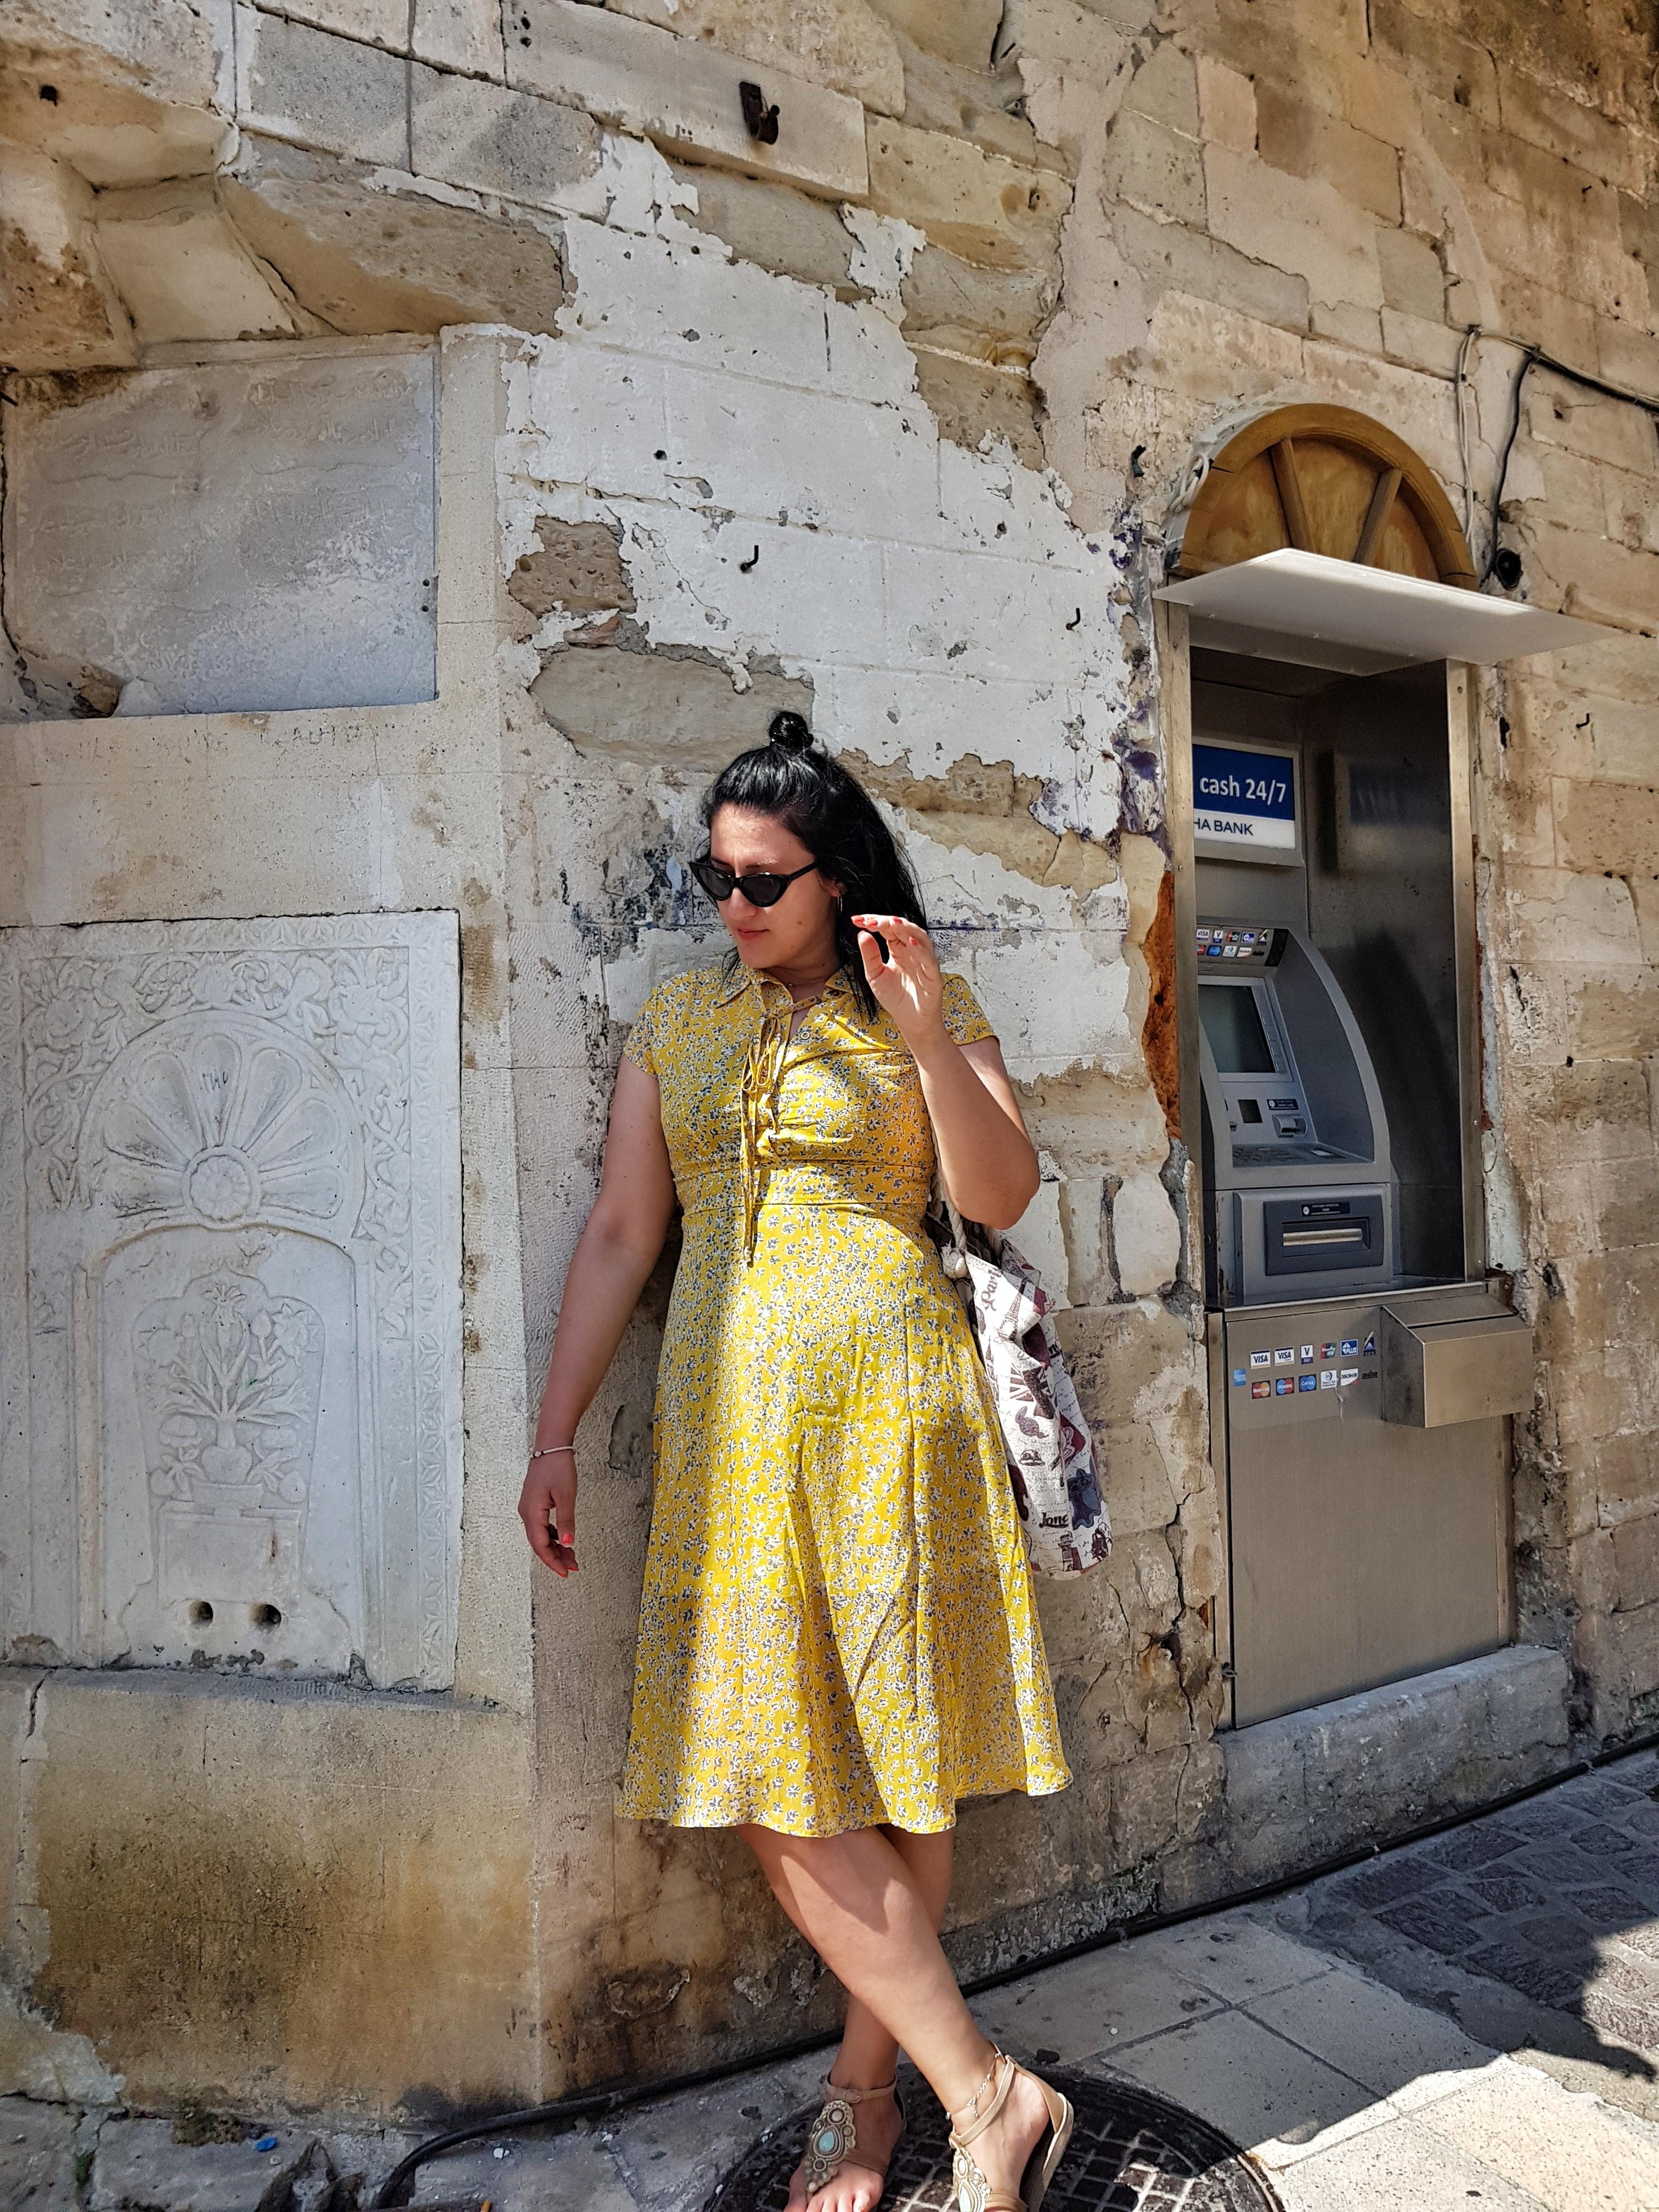 floral_print_yellow_dress_zaful_review_chania_crete